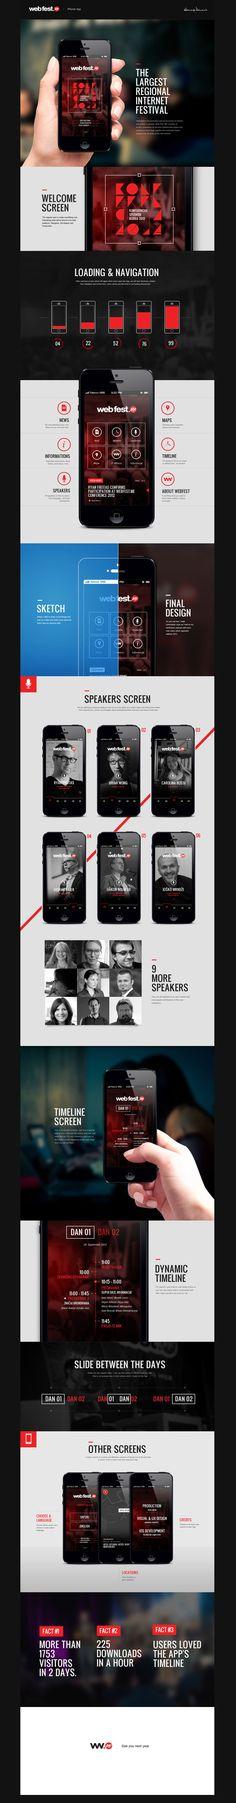 WebFest – iPhone App